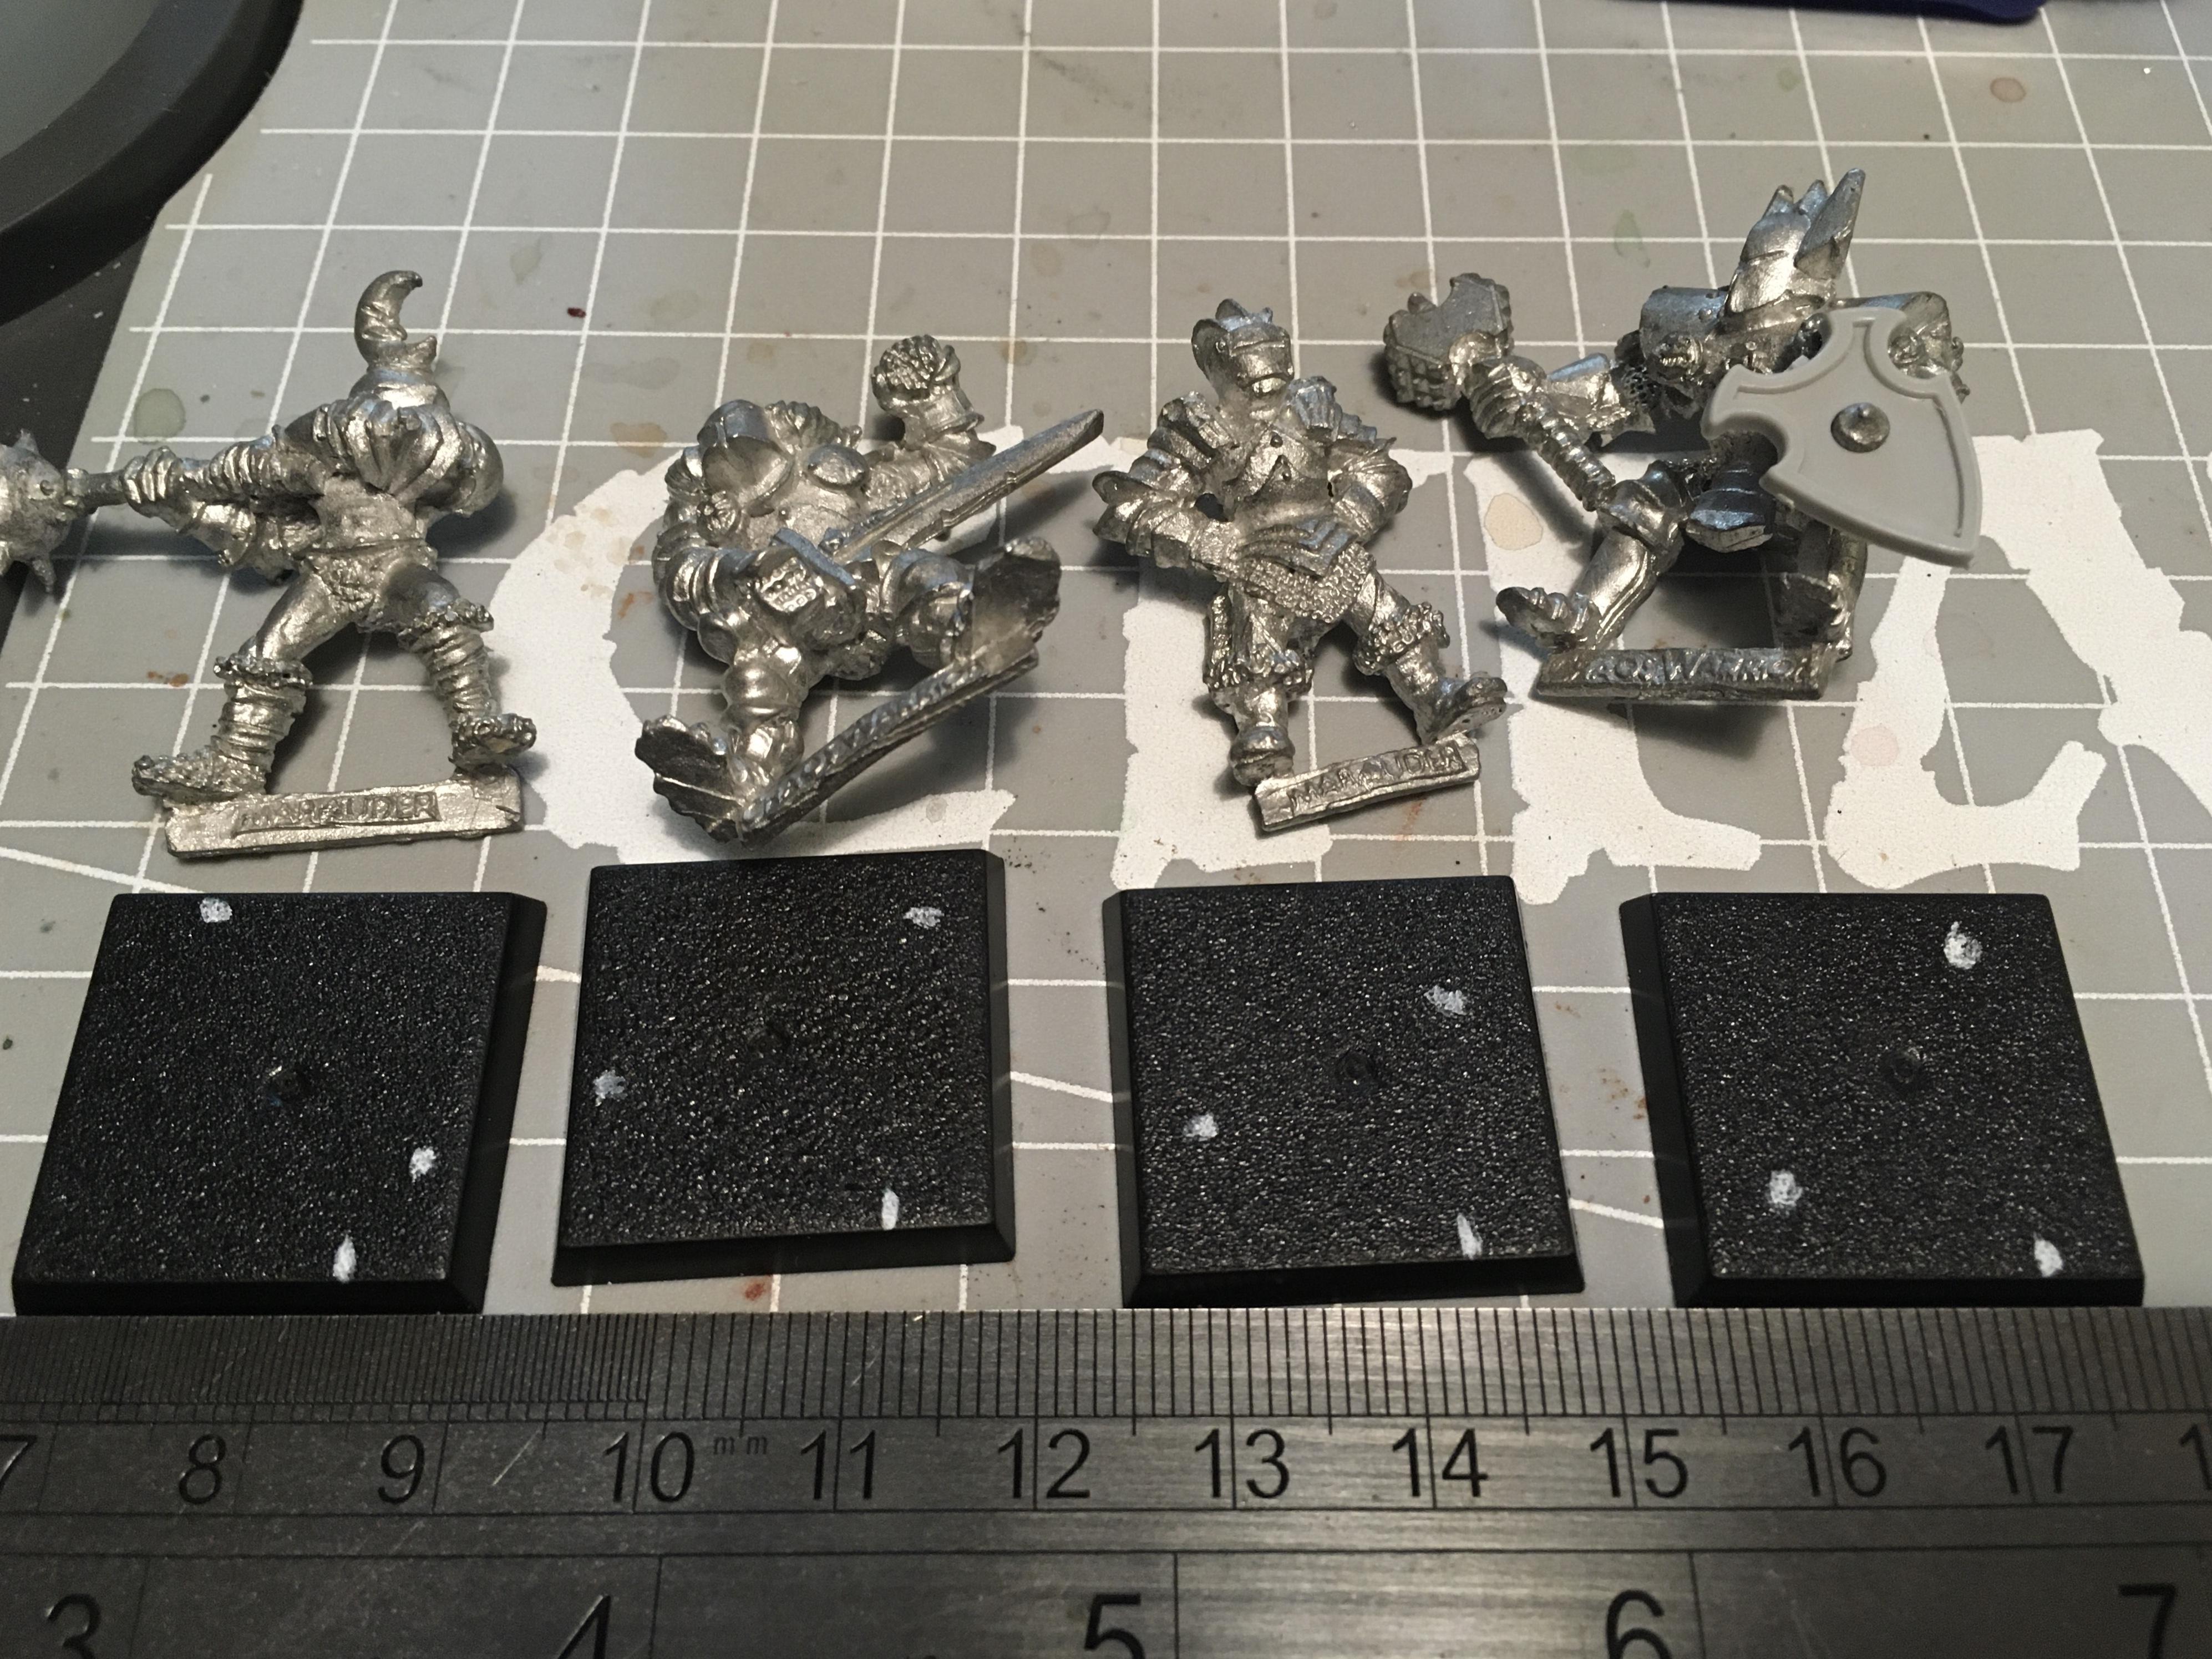 Base, Chaos, Chaos Marauder, Chaos Warrior, Square, Work In Progress